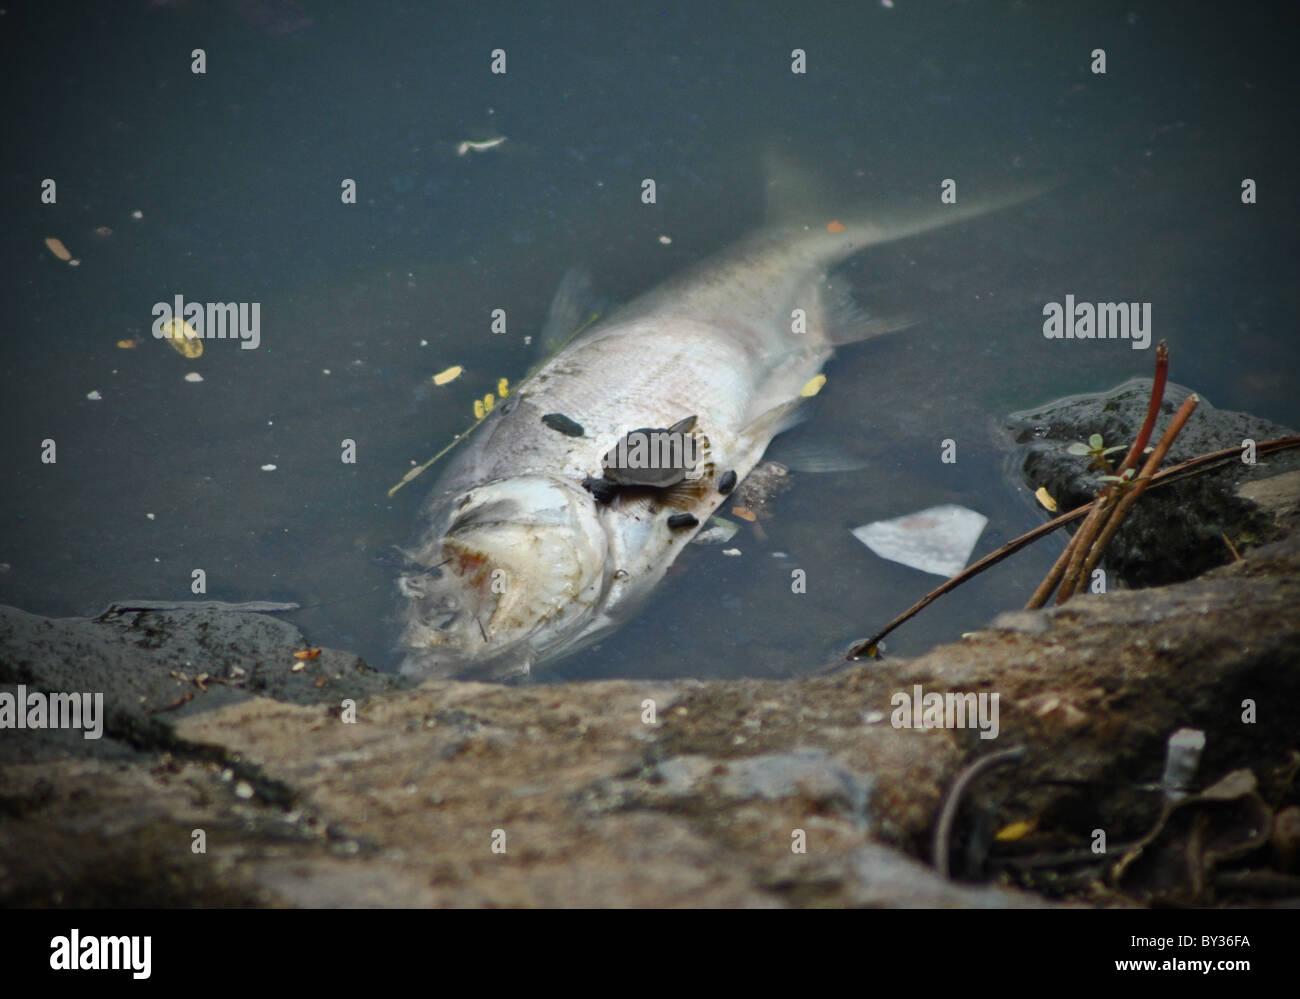 Dead fish in the polluted Hoan Kiem lake, Hanoi, Vietnam - Stock Image